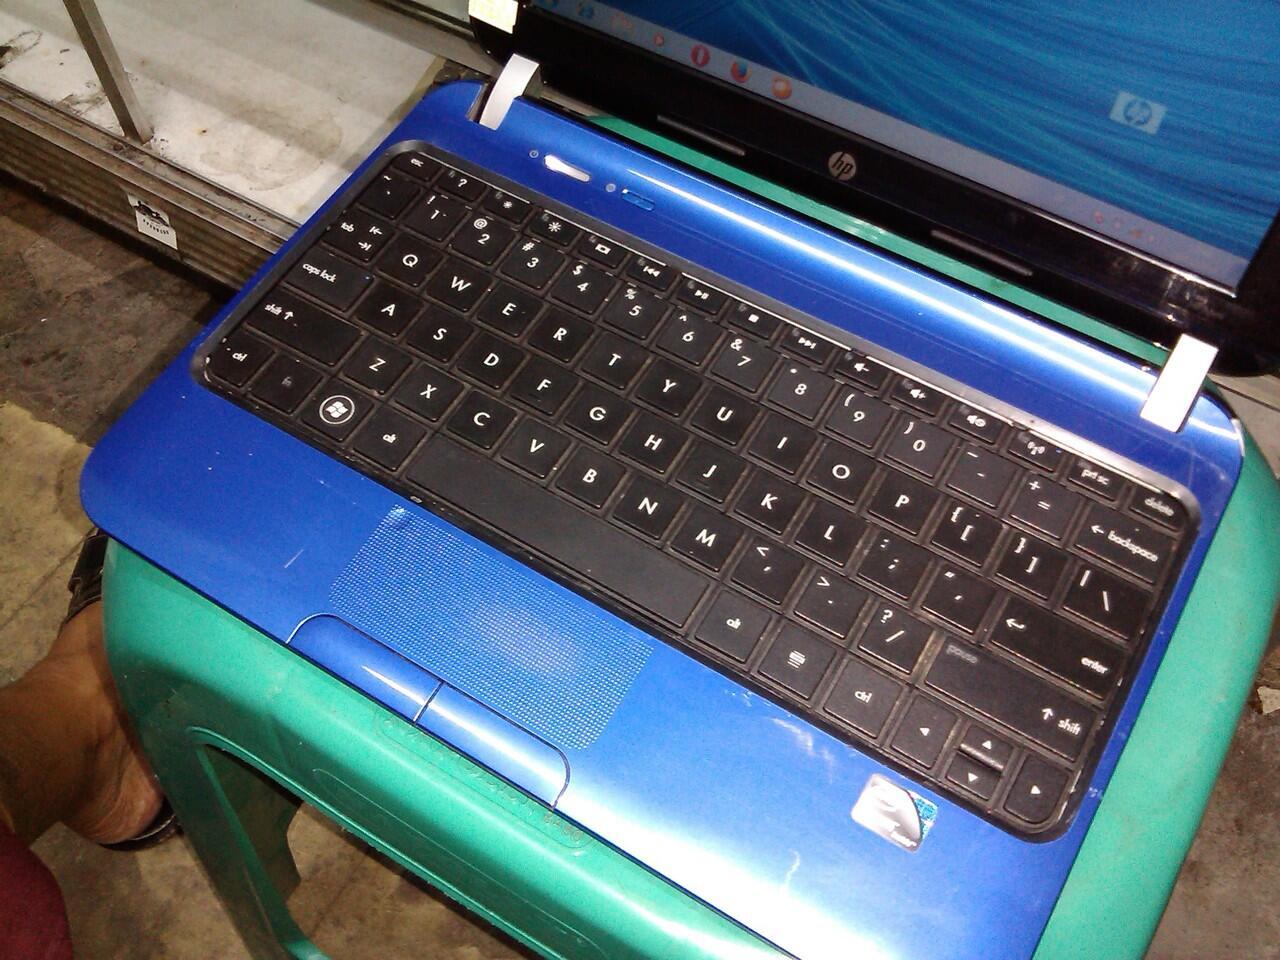 Netbook gaming hpmini n2600 ram 2 hdd 320 biru bandung